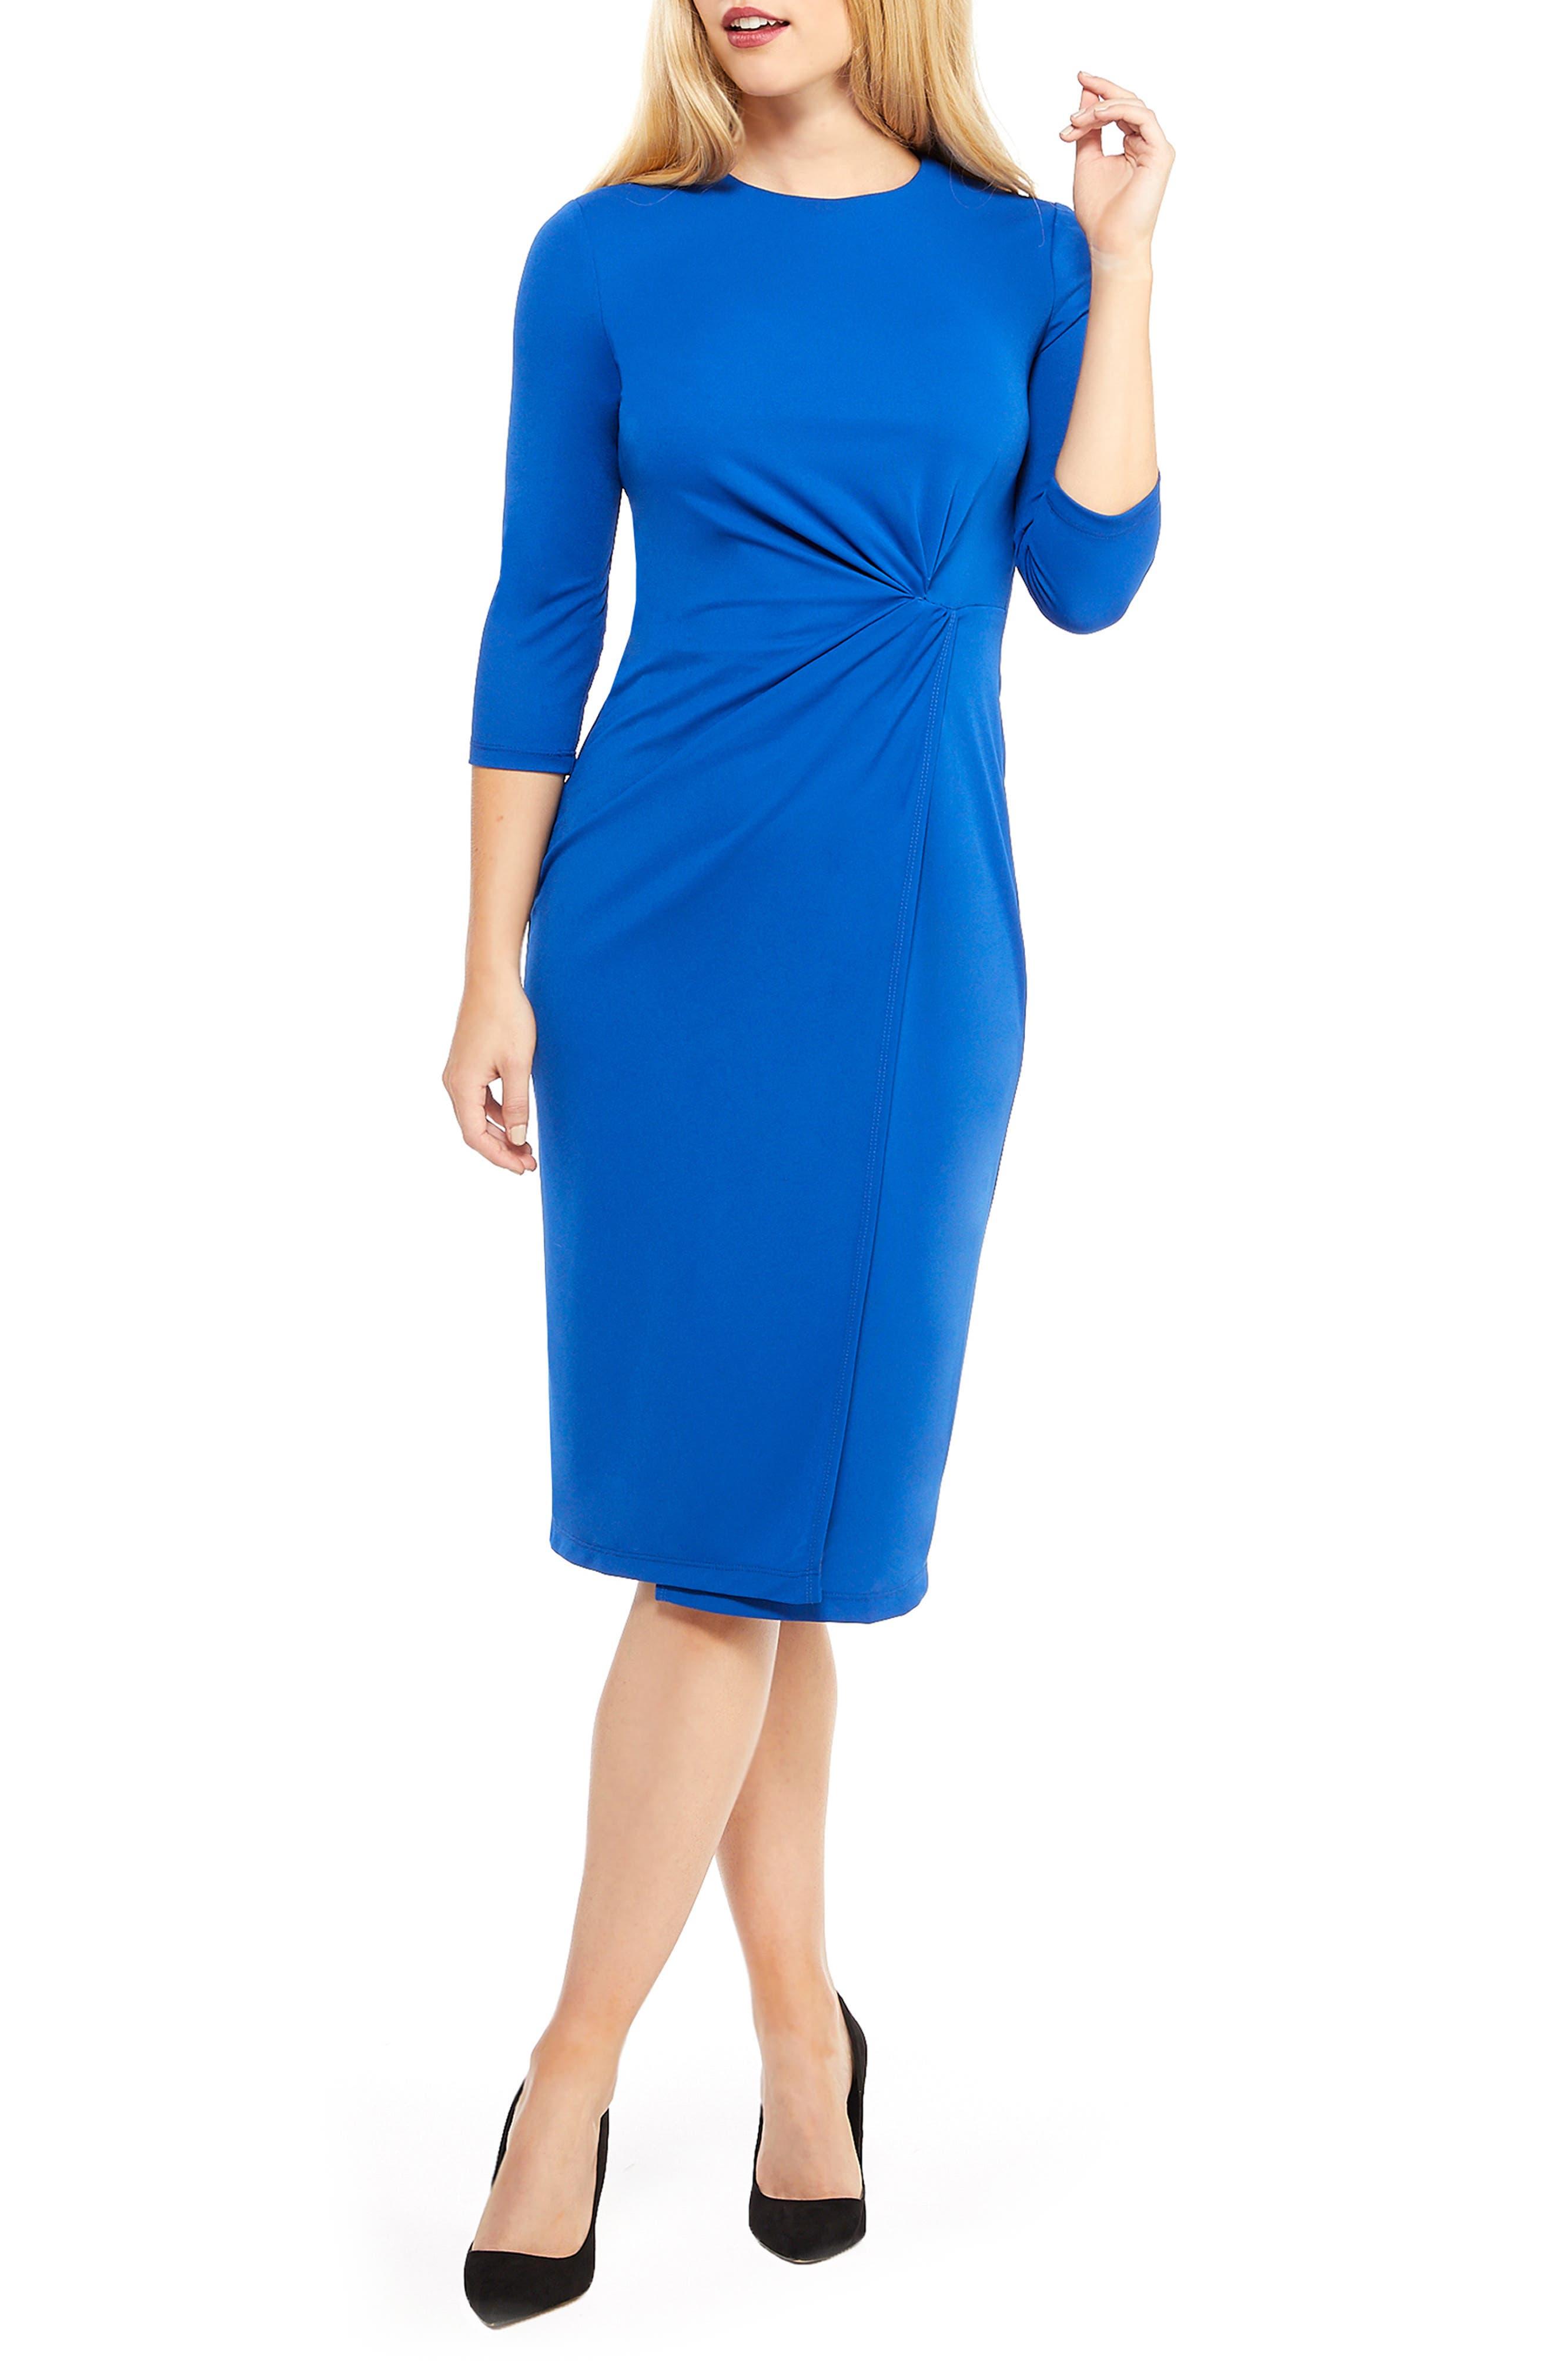 MAGGY LONDON Knot Detail Sheath Dress in Azure Blue